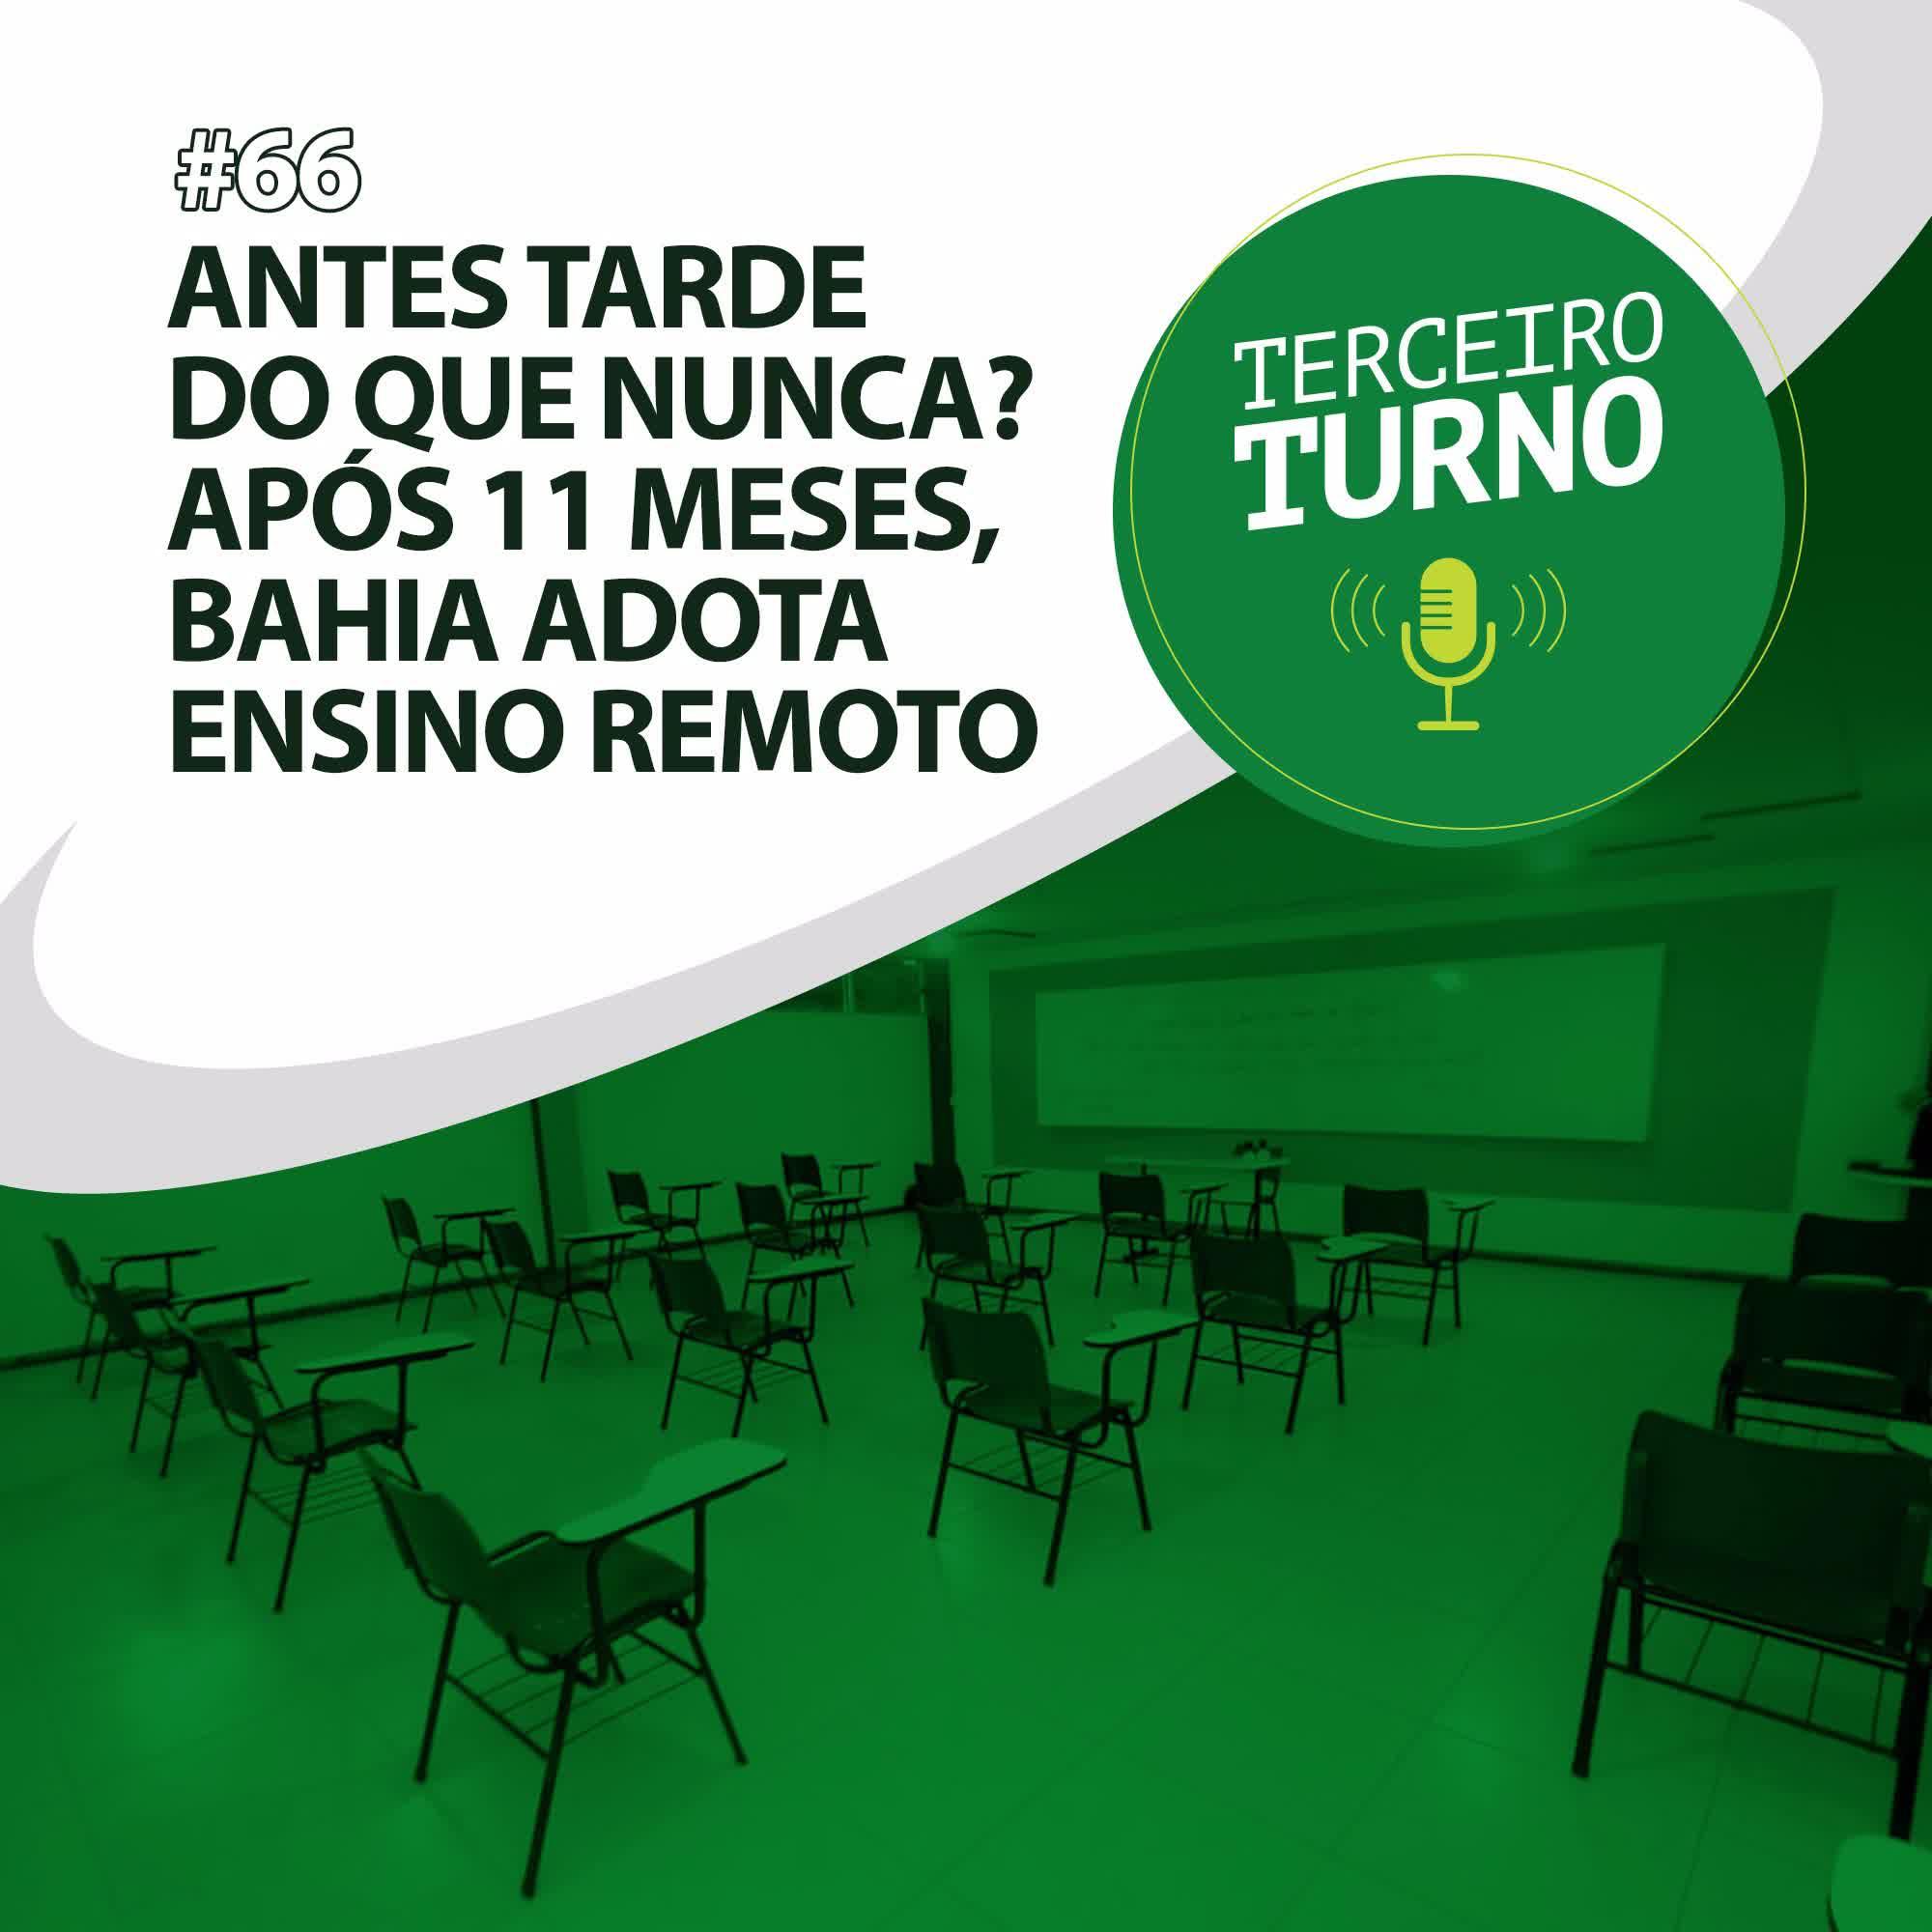 Terceiro Turno #66: Antes tarde do que nunca? Após 11 meses, Bahia adota ensino remoto